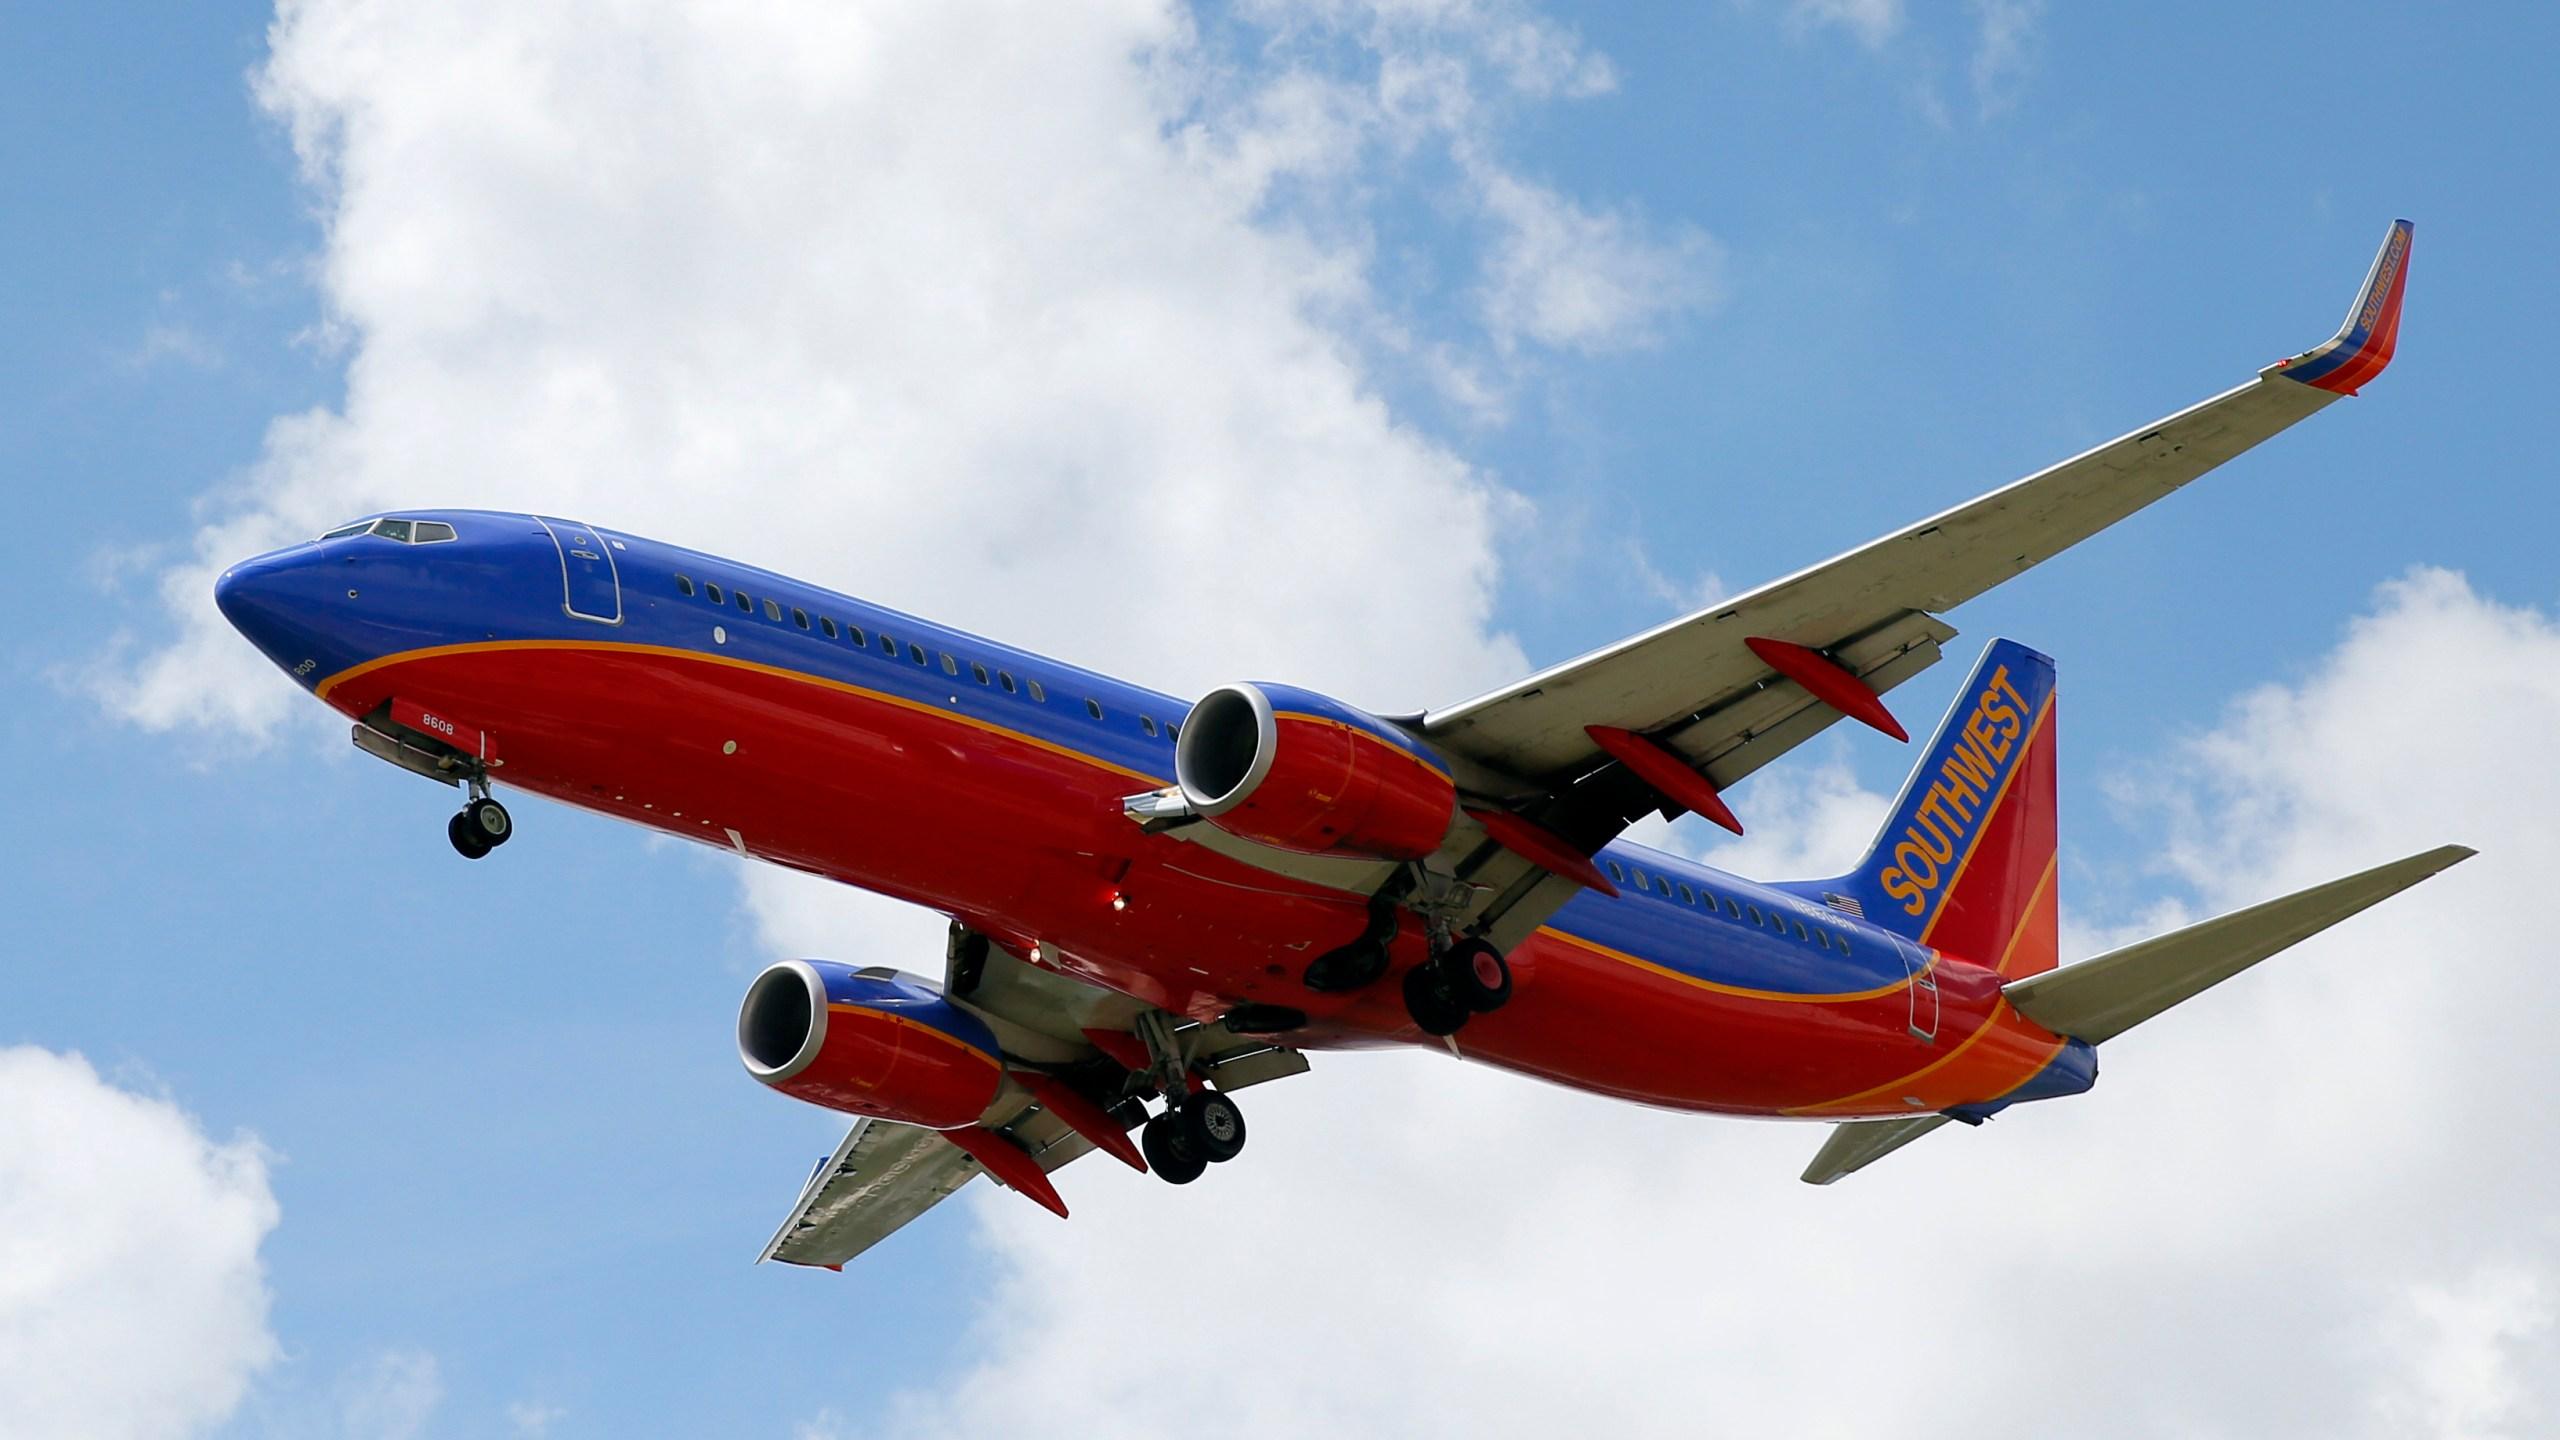 Earns_Southwest_Airlines_39901-159532.jpg15953955